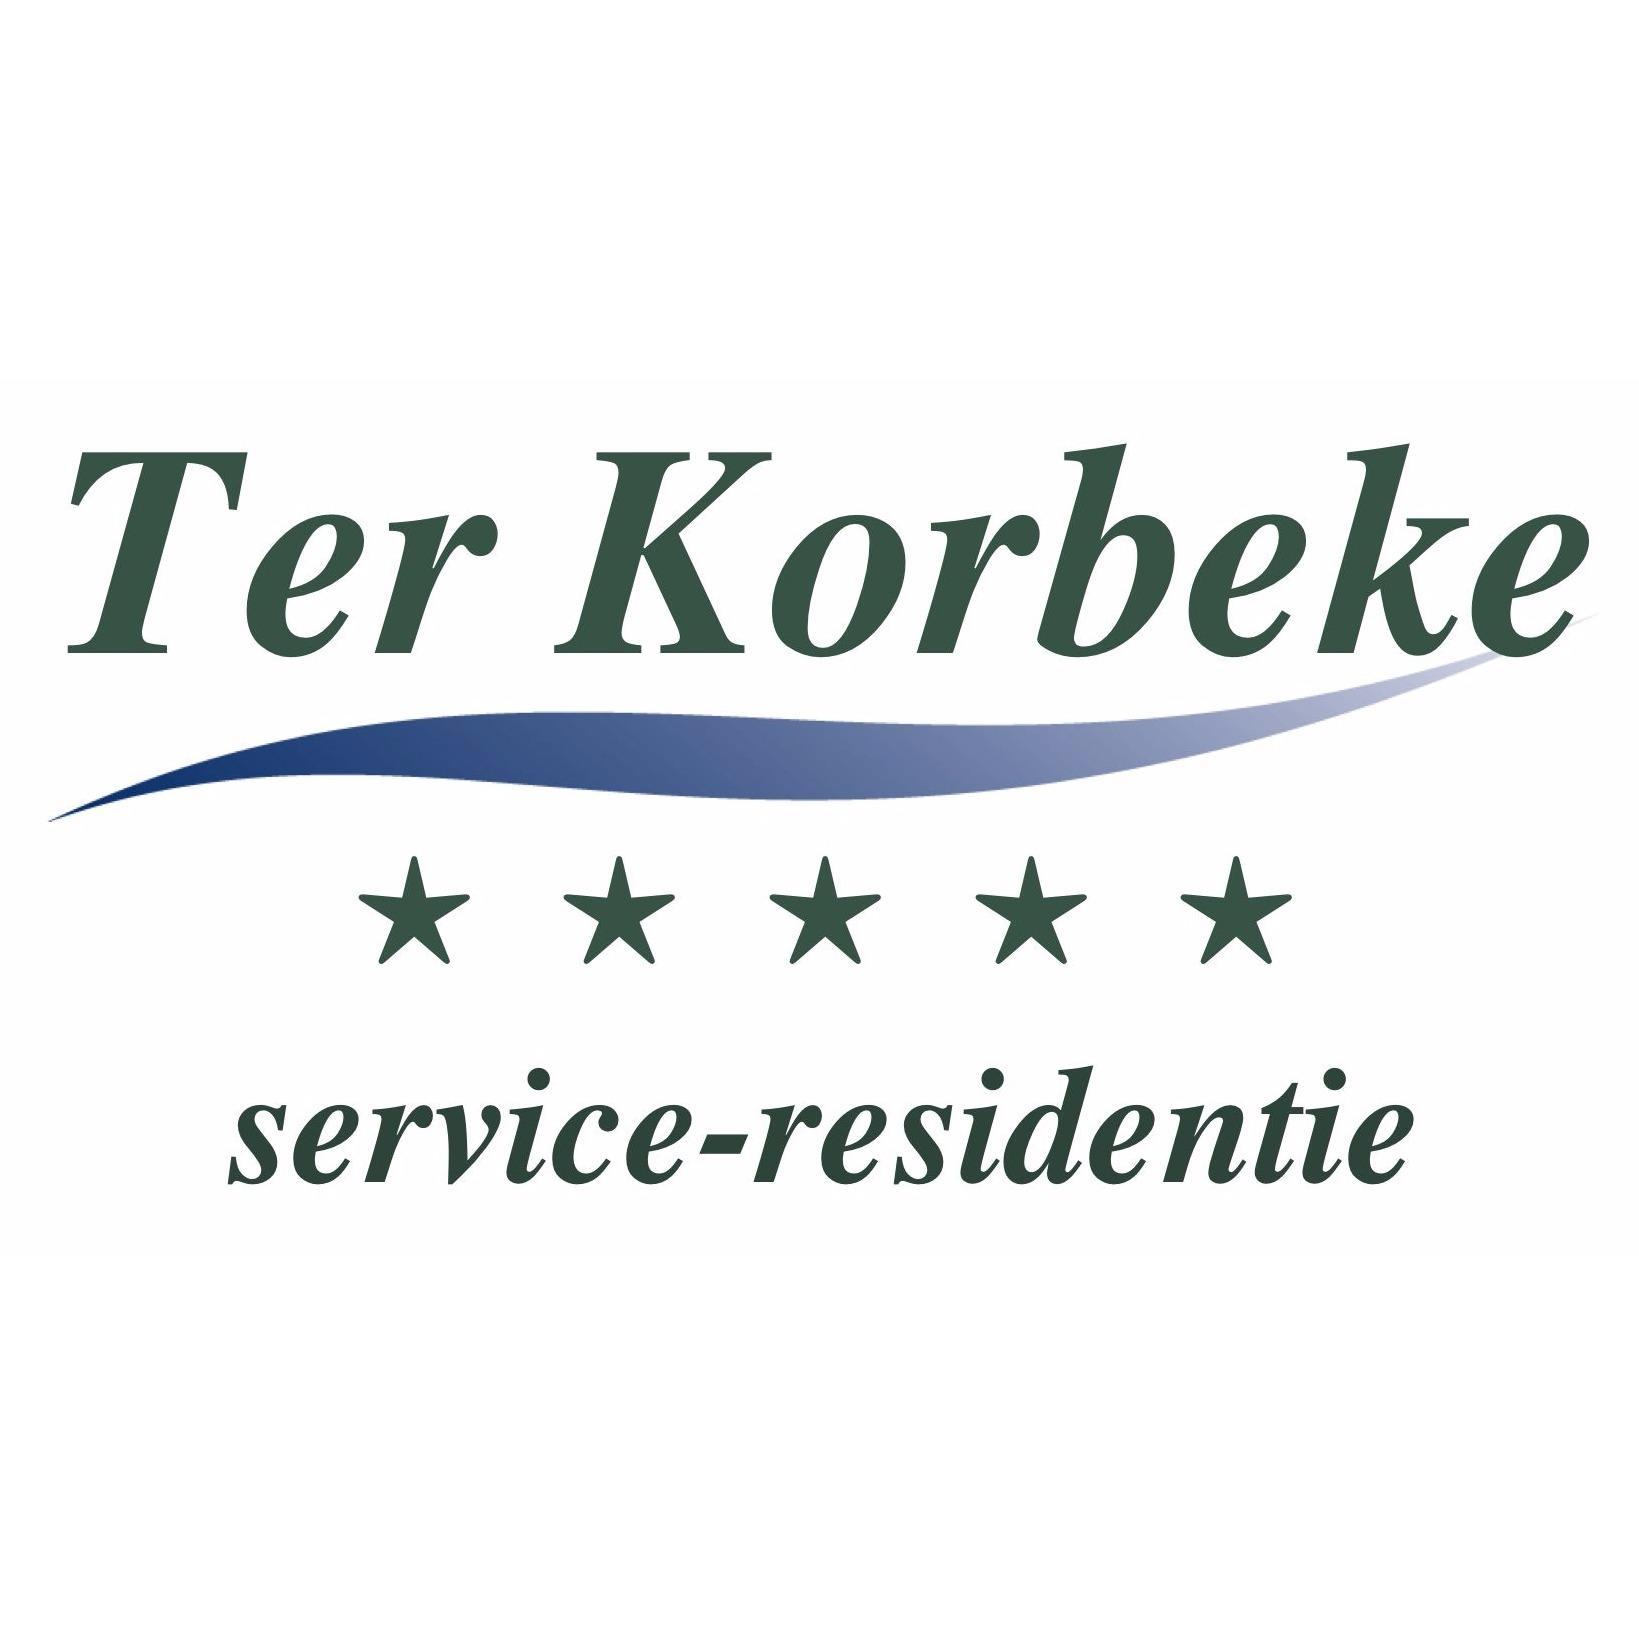 Ter korbeke Service - Residentie